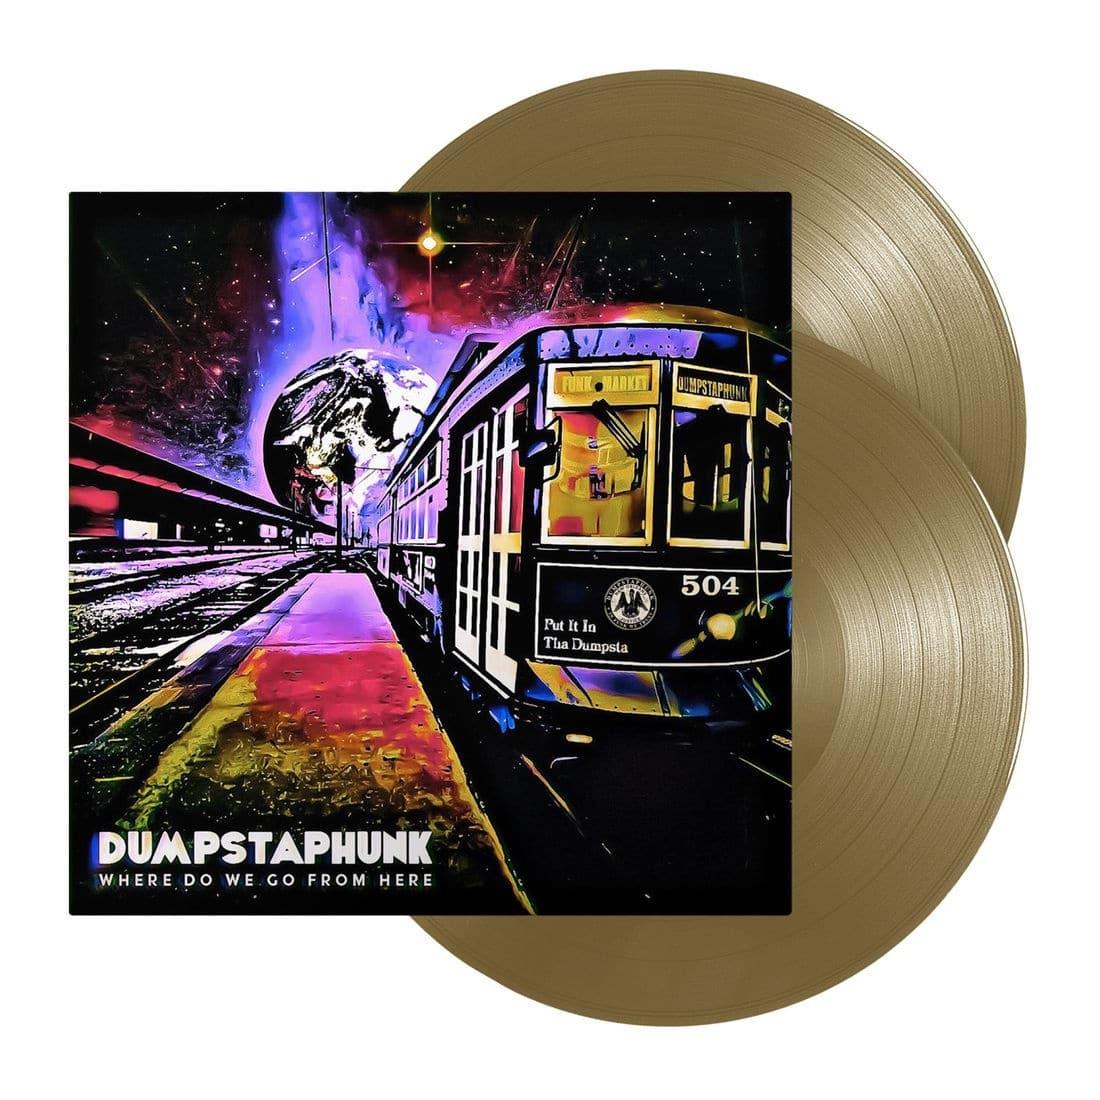 DUMPSTAPHUNK - WHERE DO WE GO FROM HERE LTD EDITION GOLD VINYL